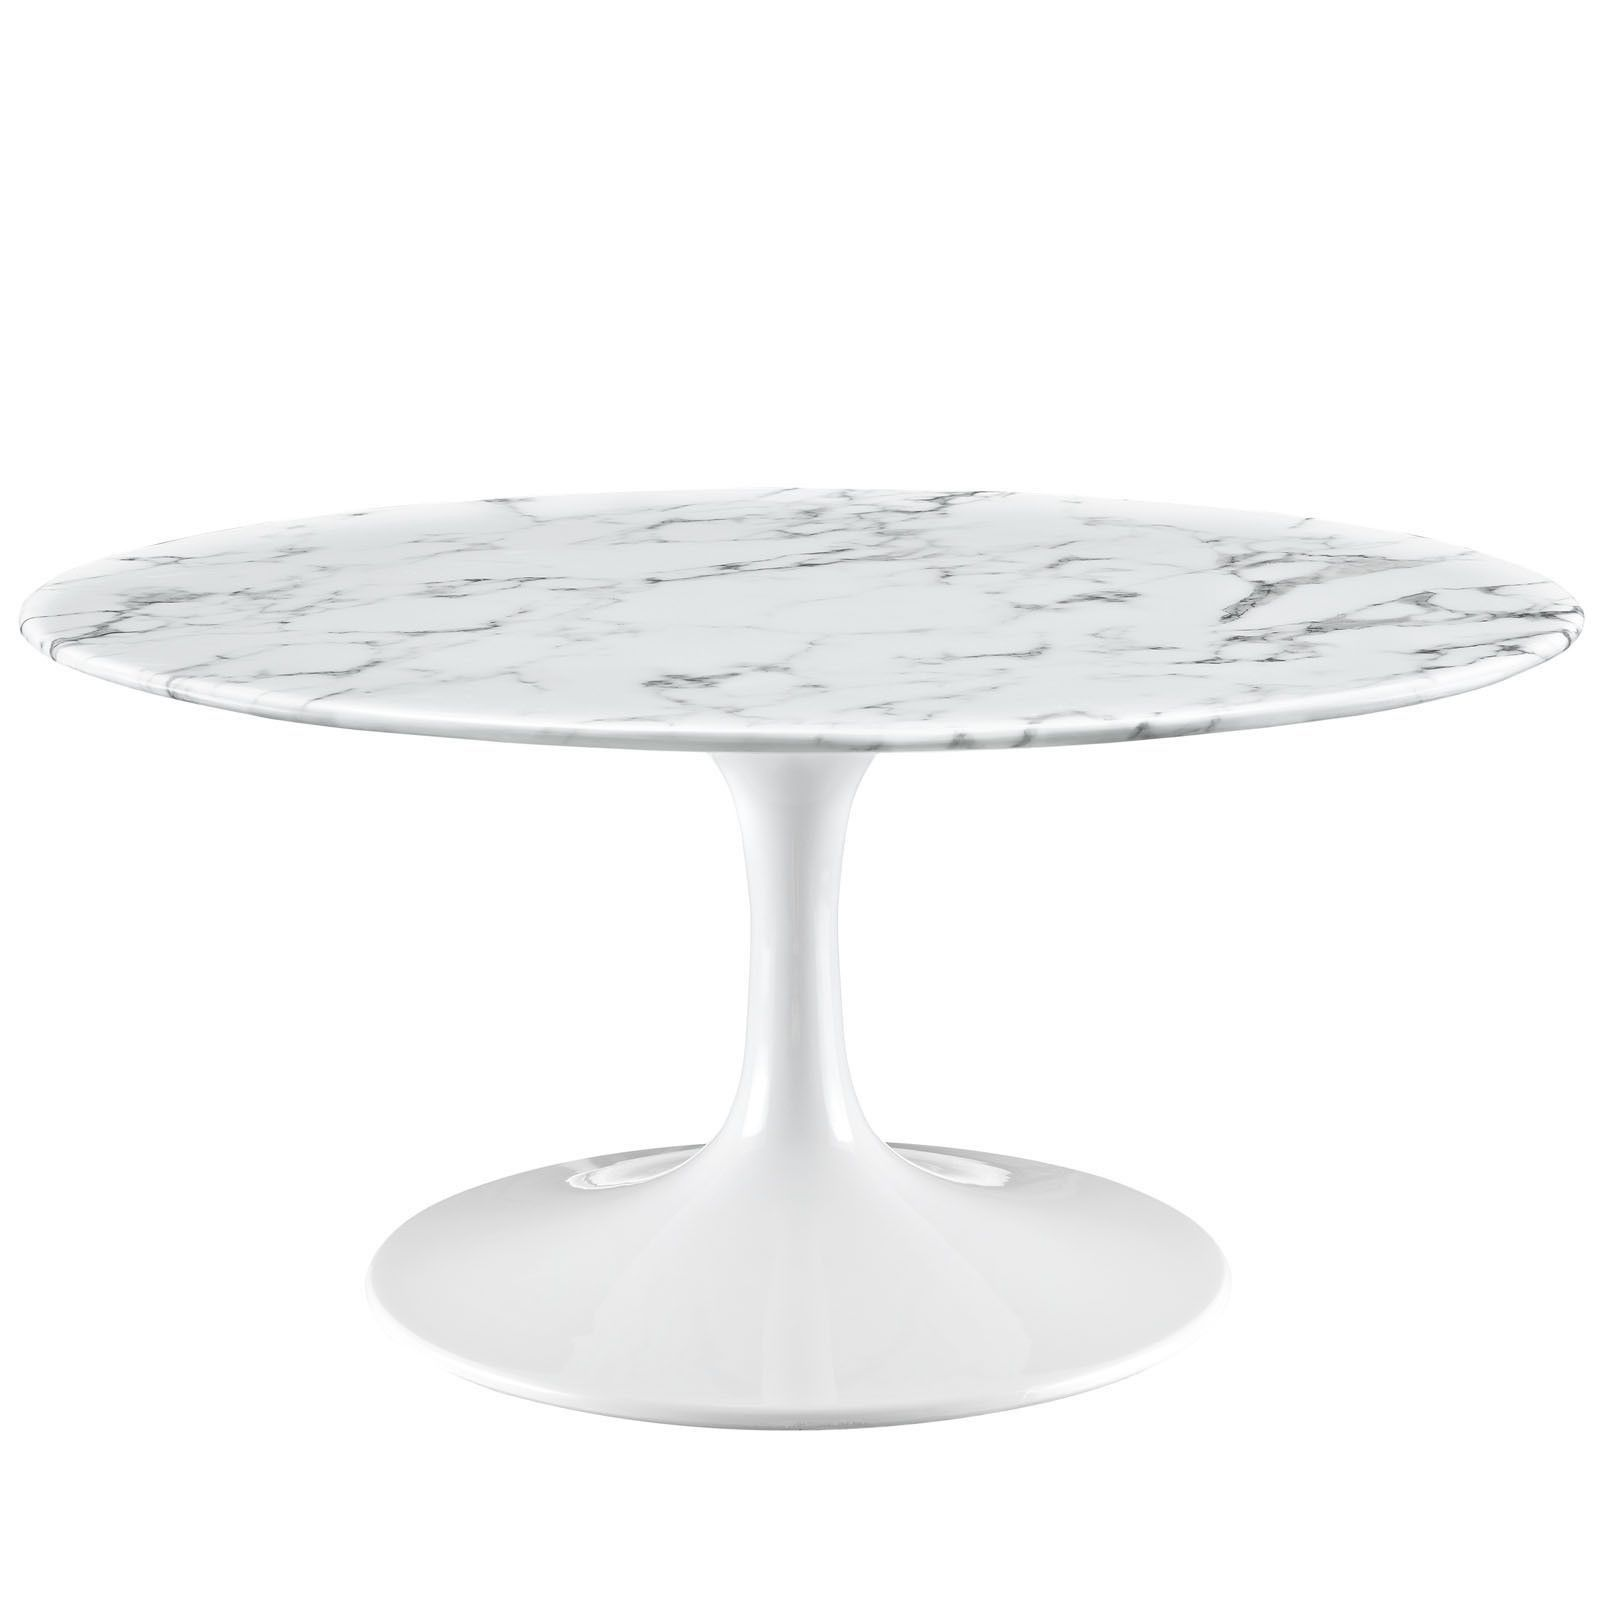 Eero saarinen tulip style 36 marble dining table coffee